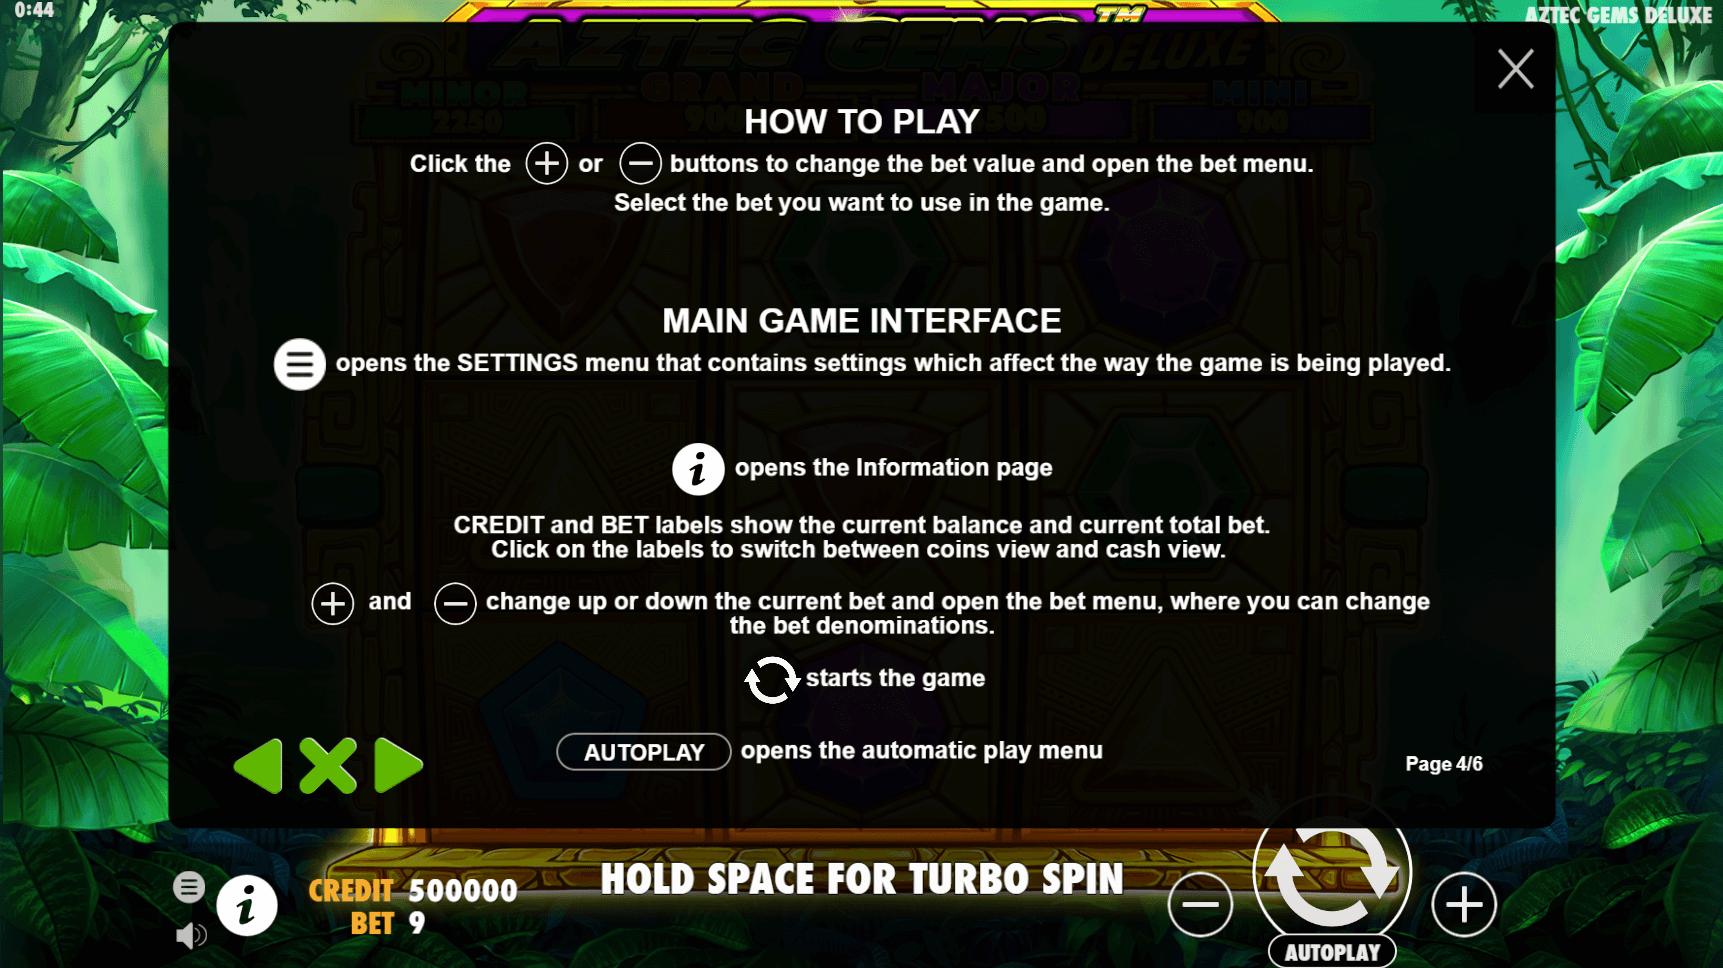 Play Aztecs Treasure Feature Guarantee Slot Machine Free with No Download